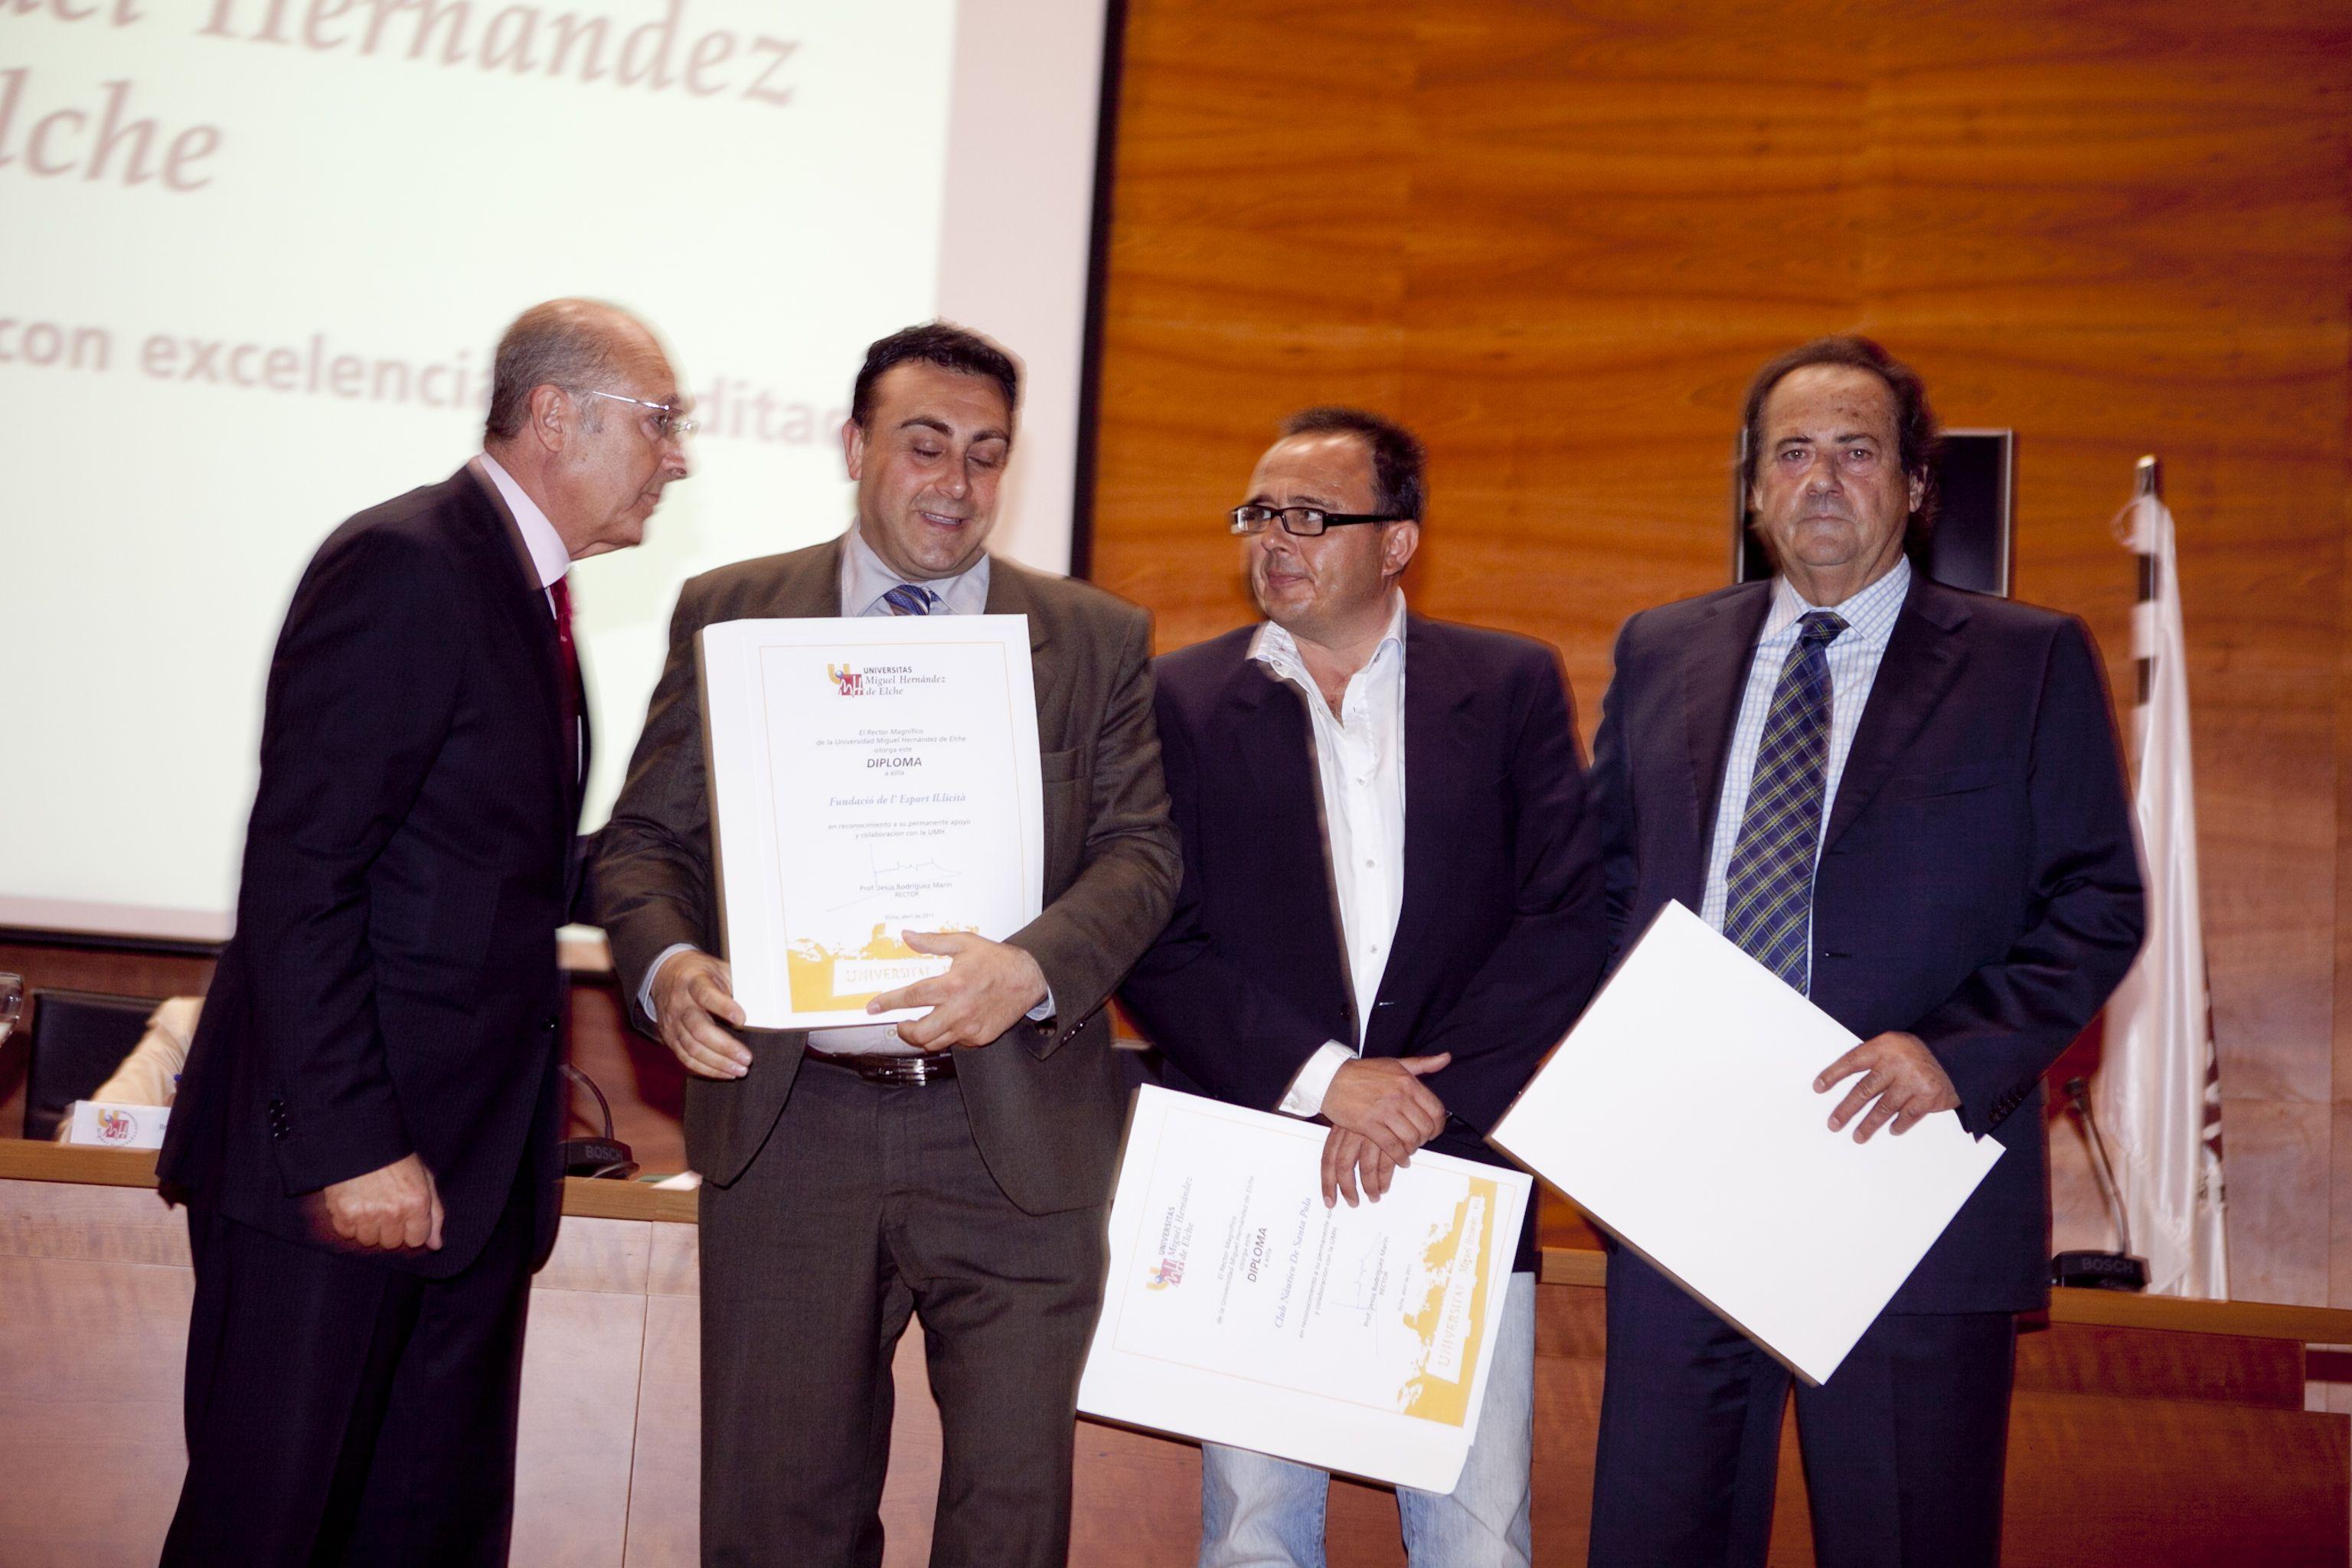 umh-diplomas-rector_mg_6495.jpg